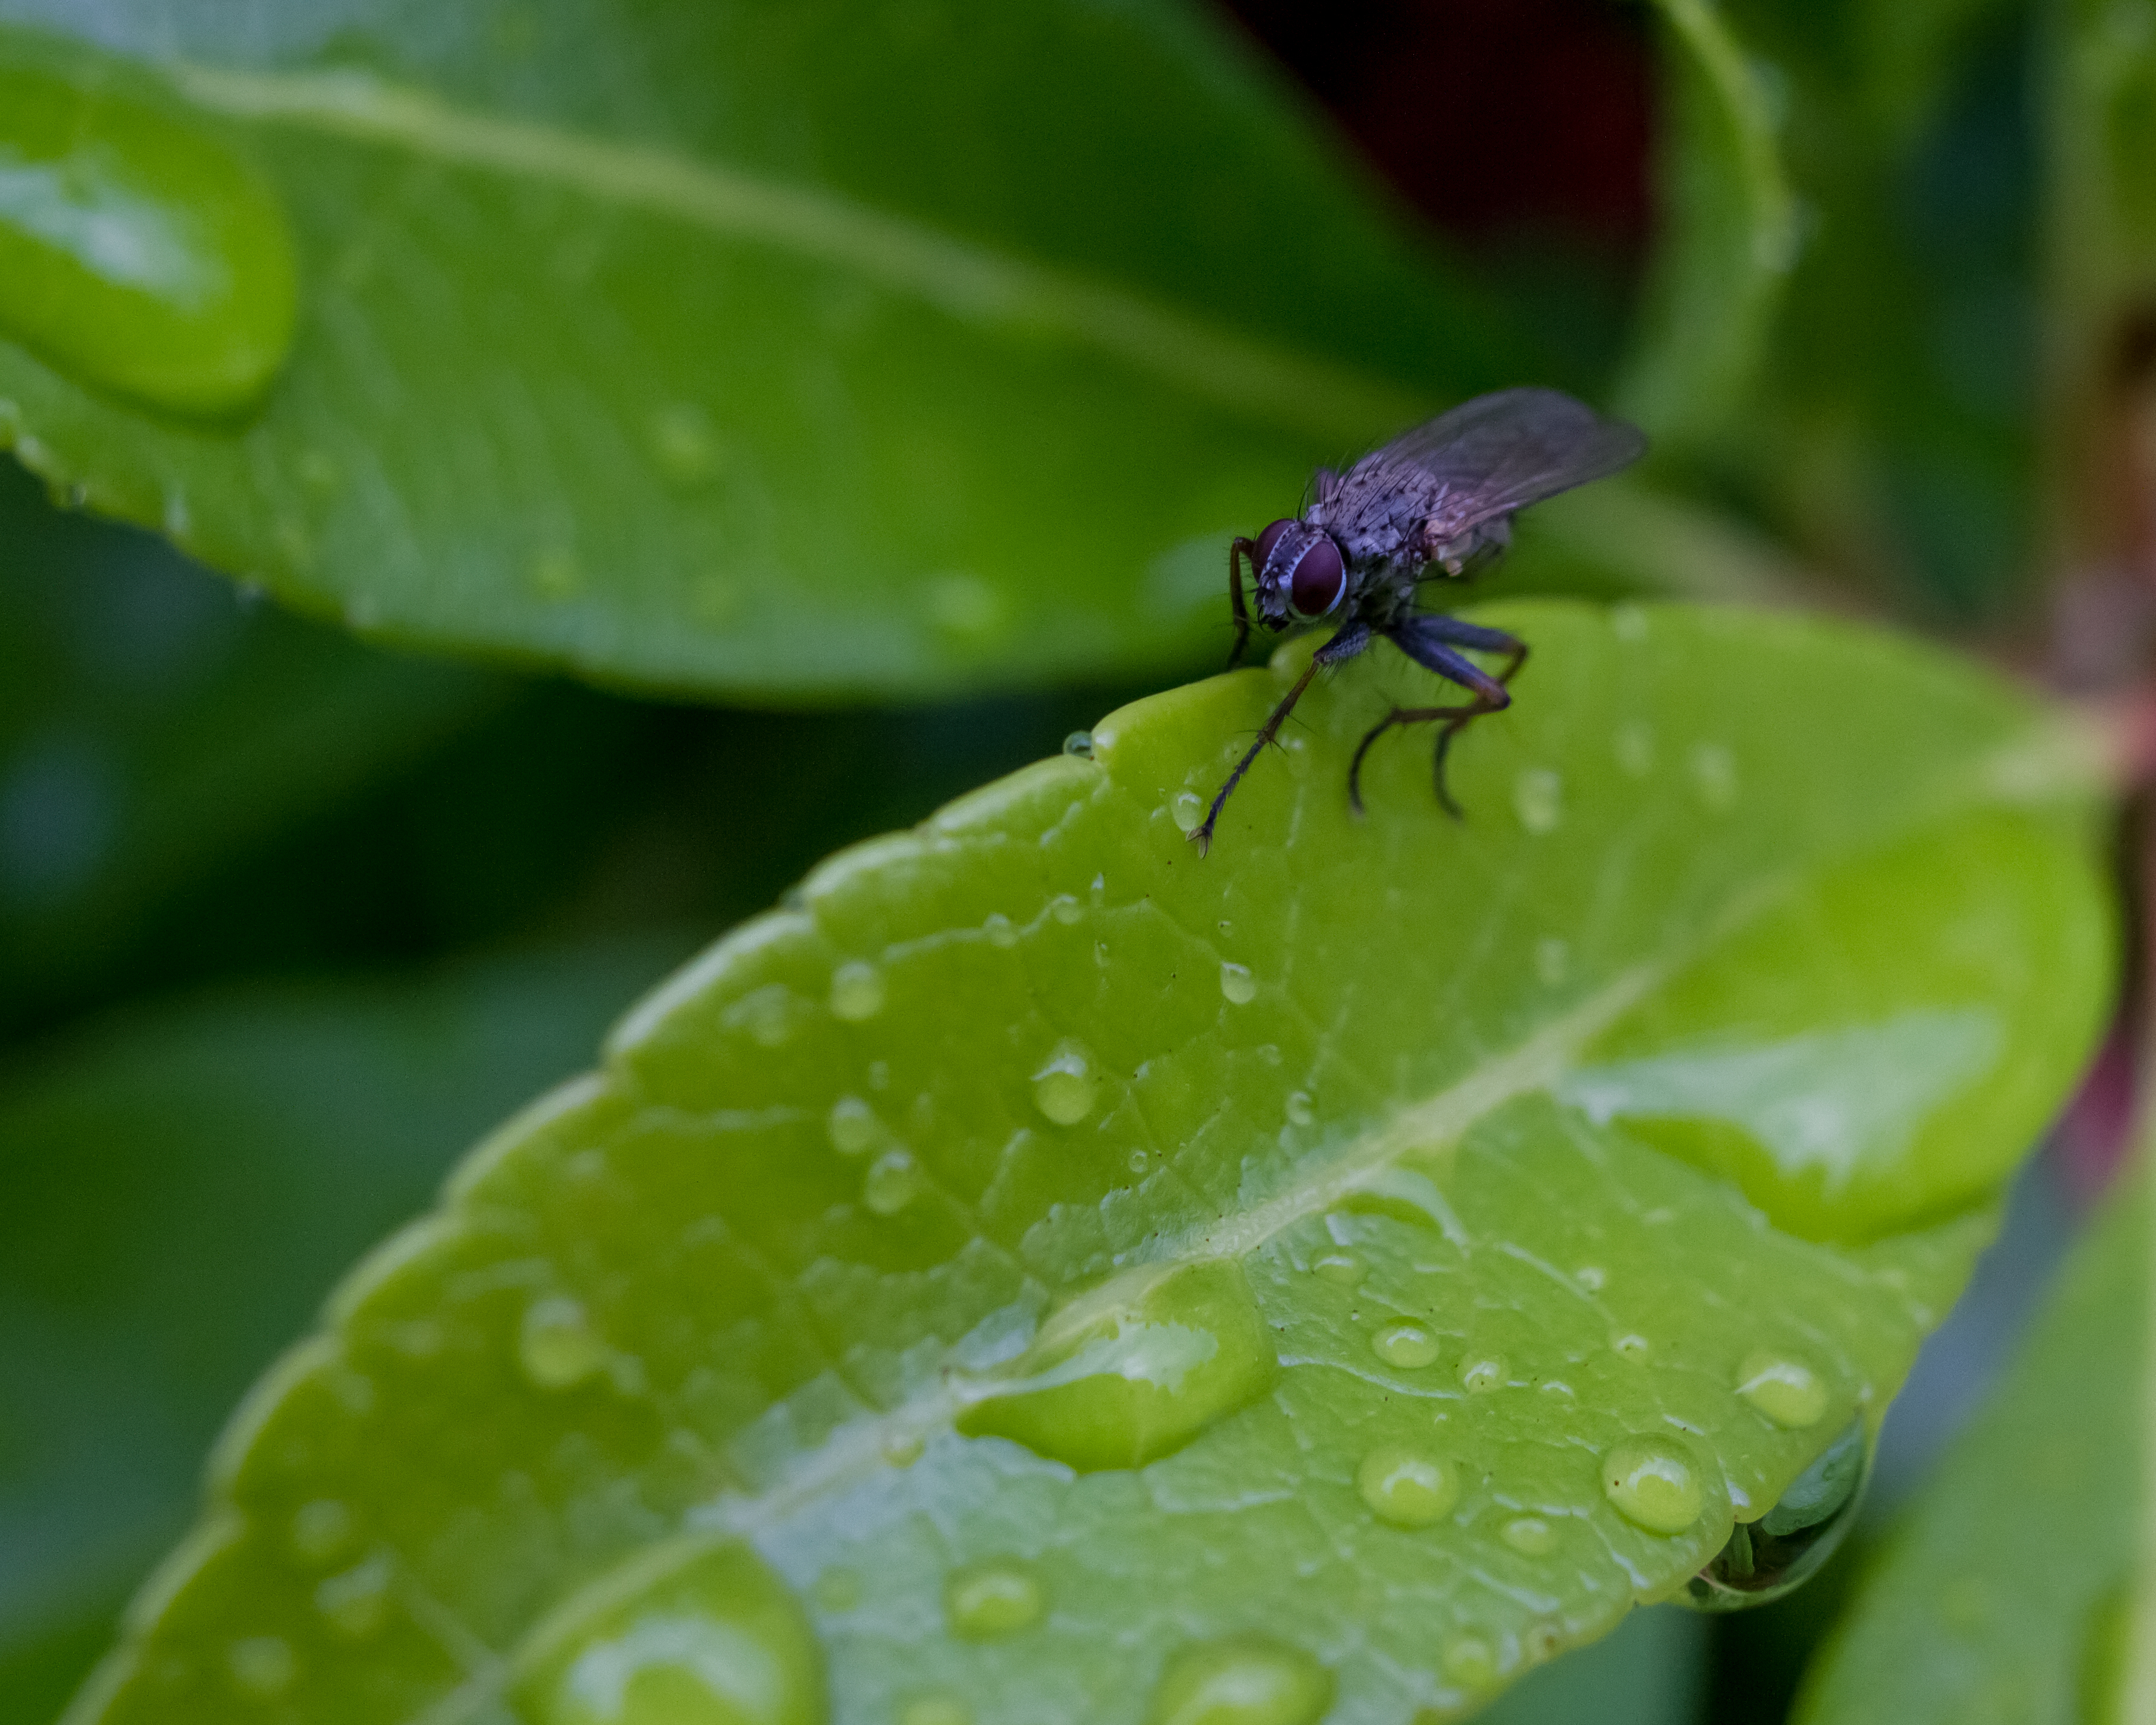 Greenfly?